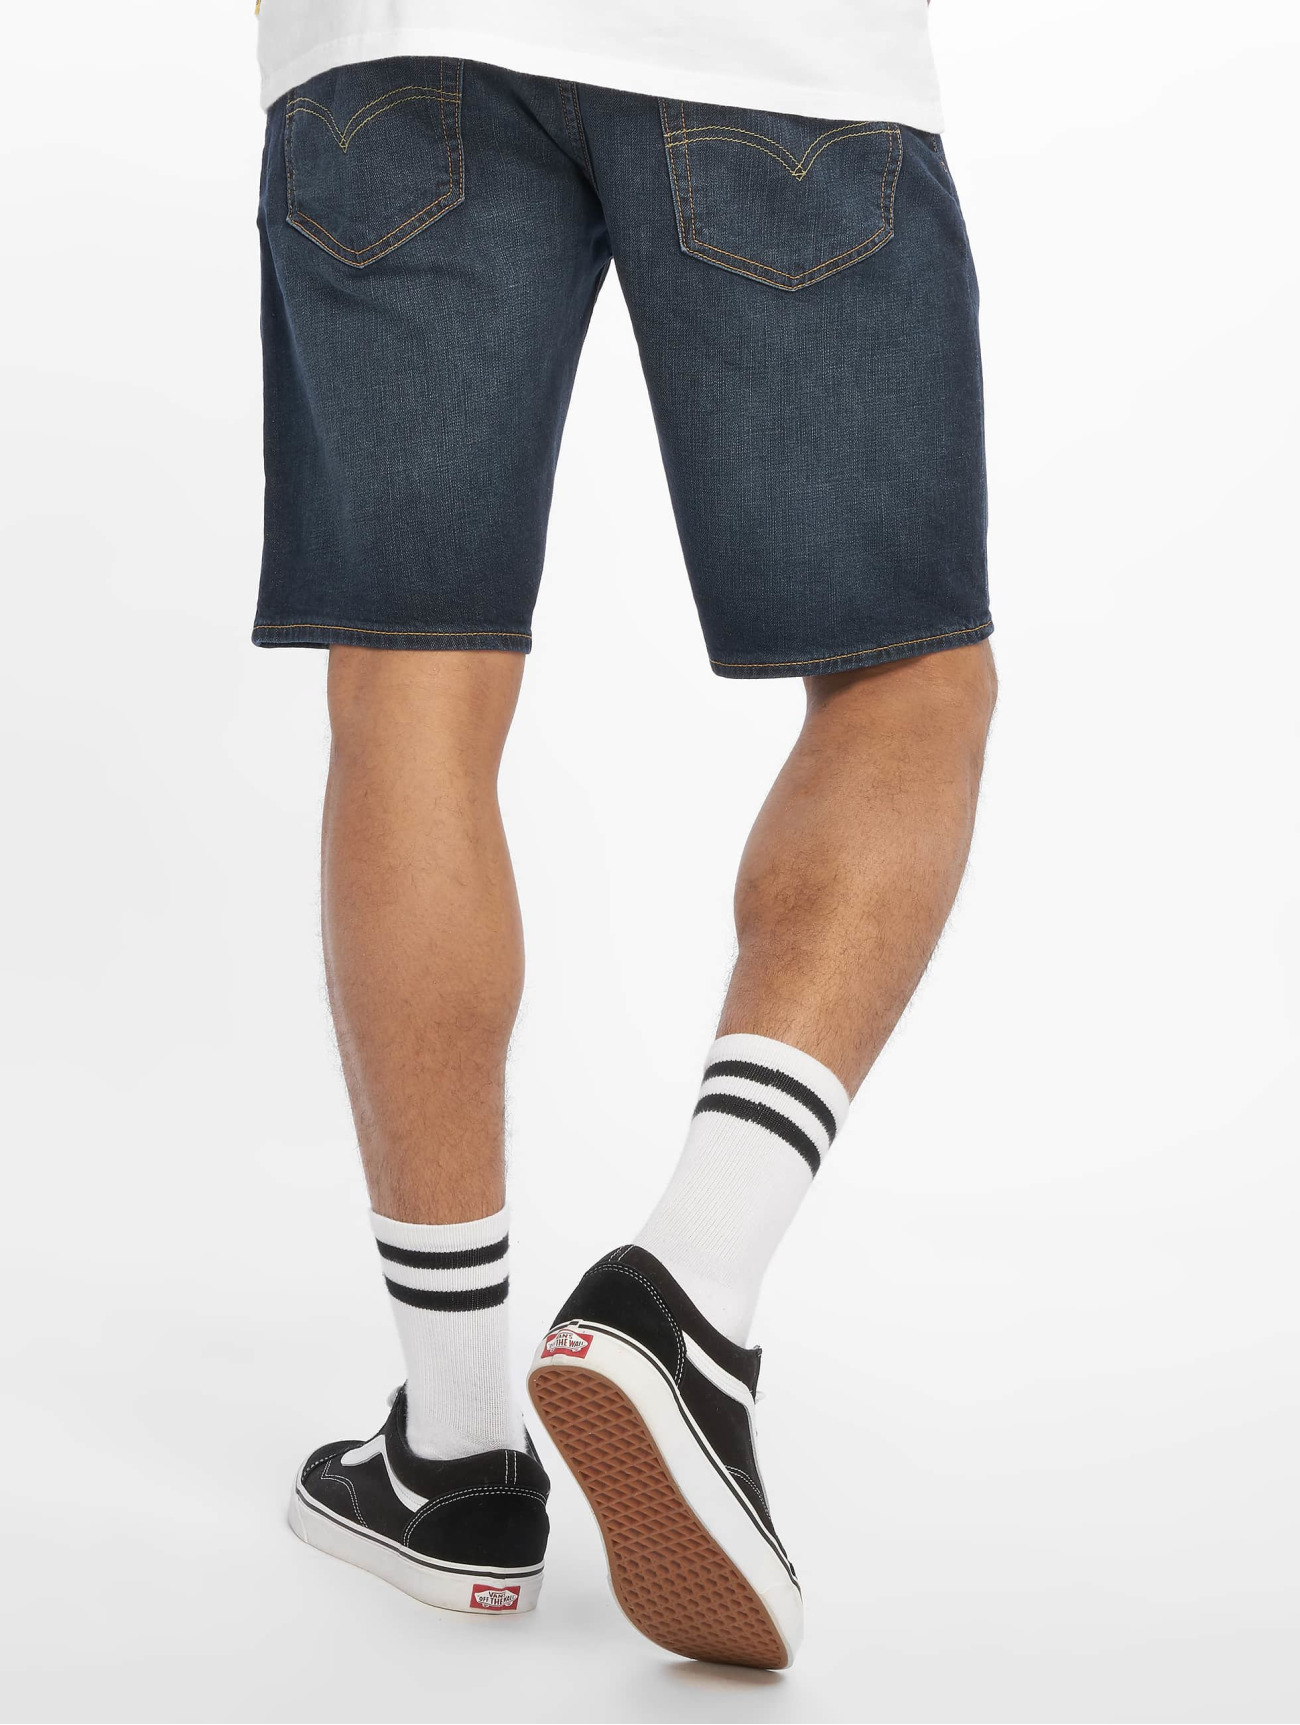 Levi's®  502 Taper Hemmed Saturn Denim  indigo Homme Short  652284 Homme Pantalons & Shorts